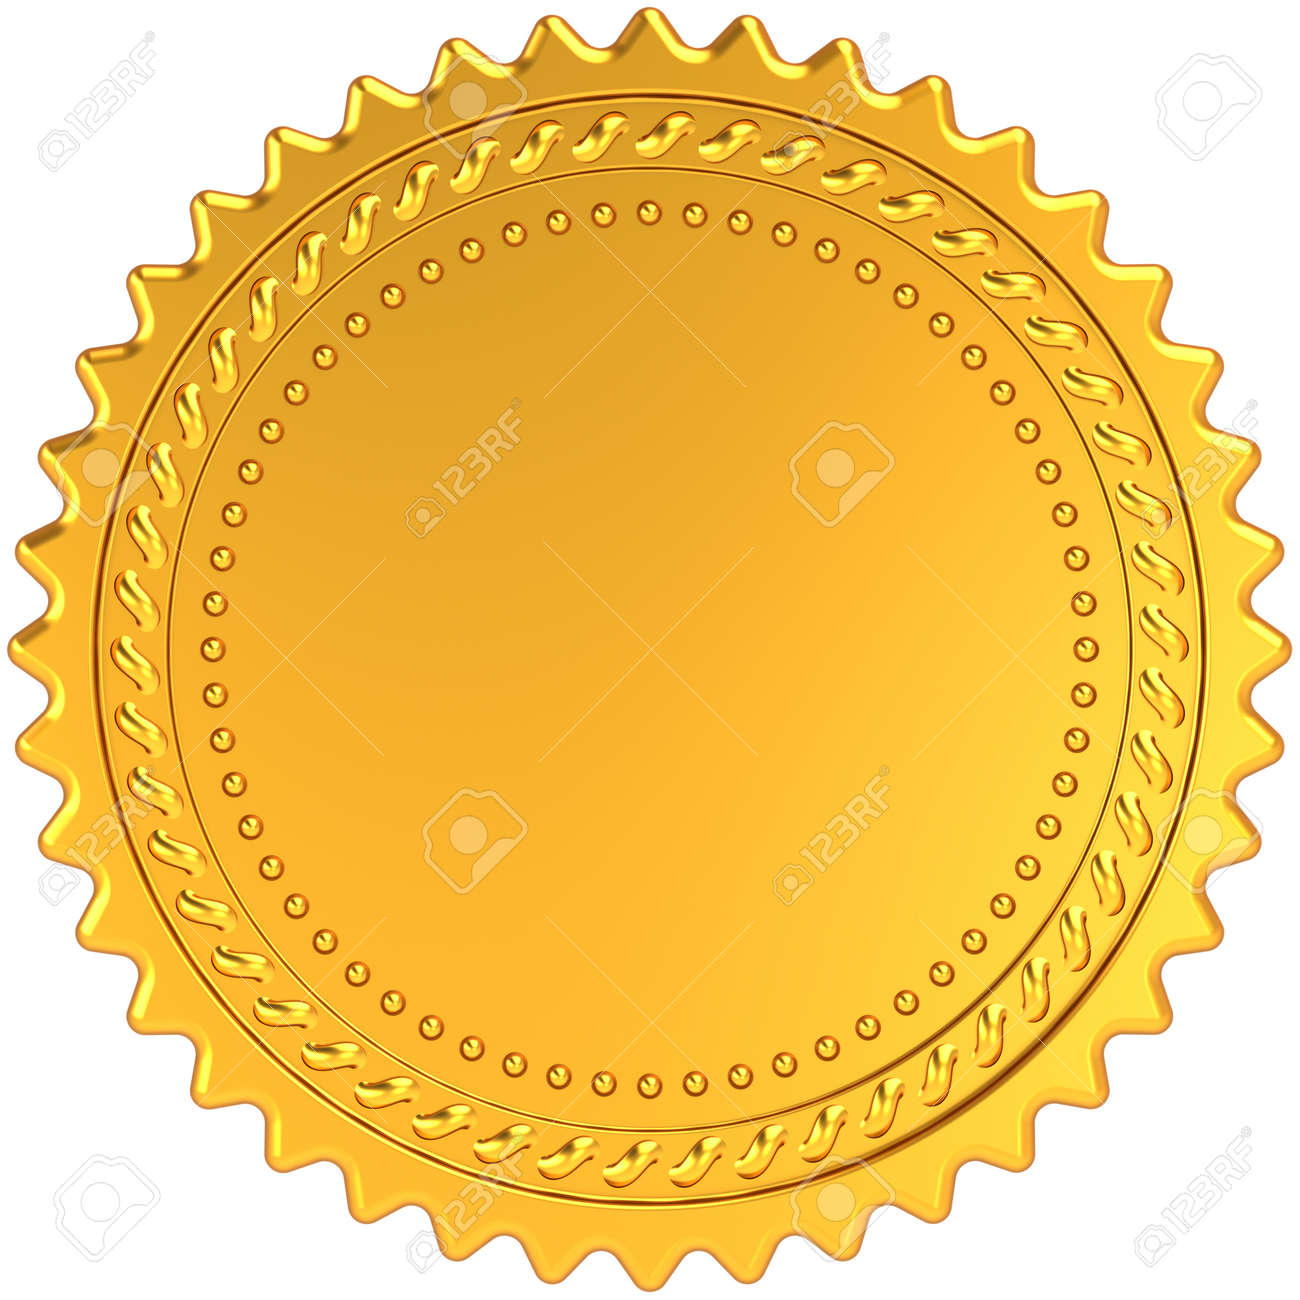 golden award medal blank seal luxury champion badge label